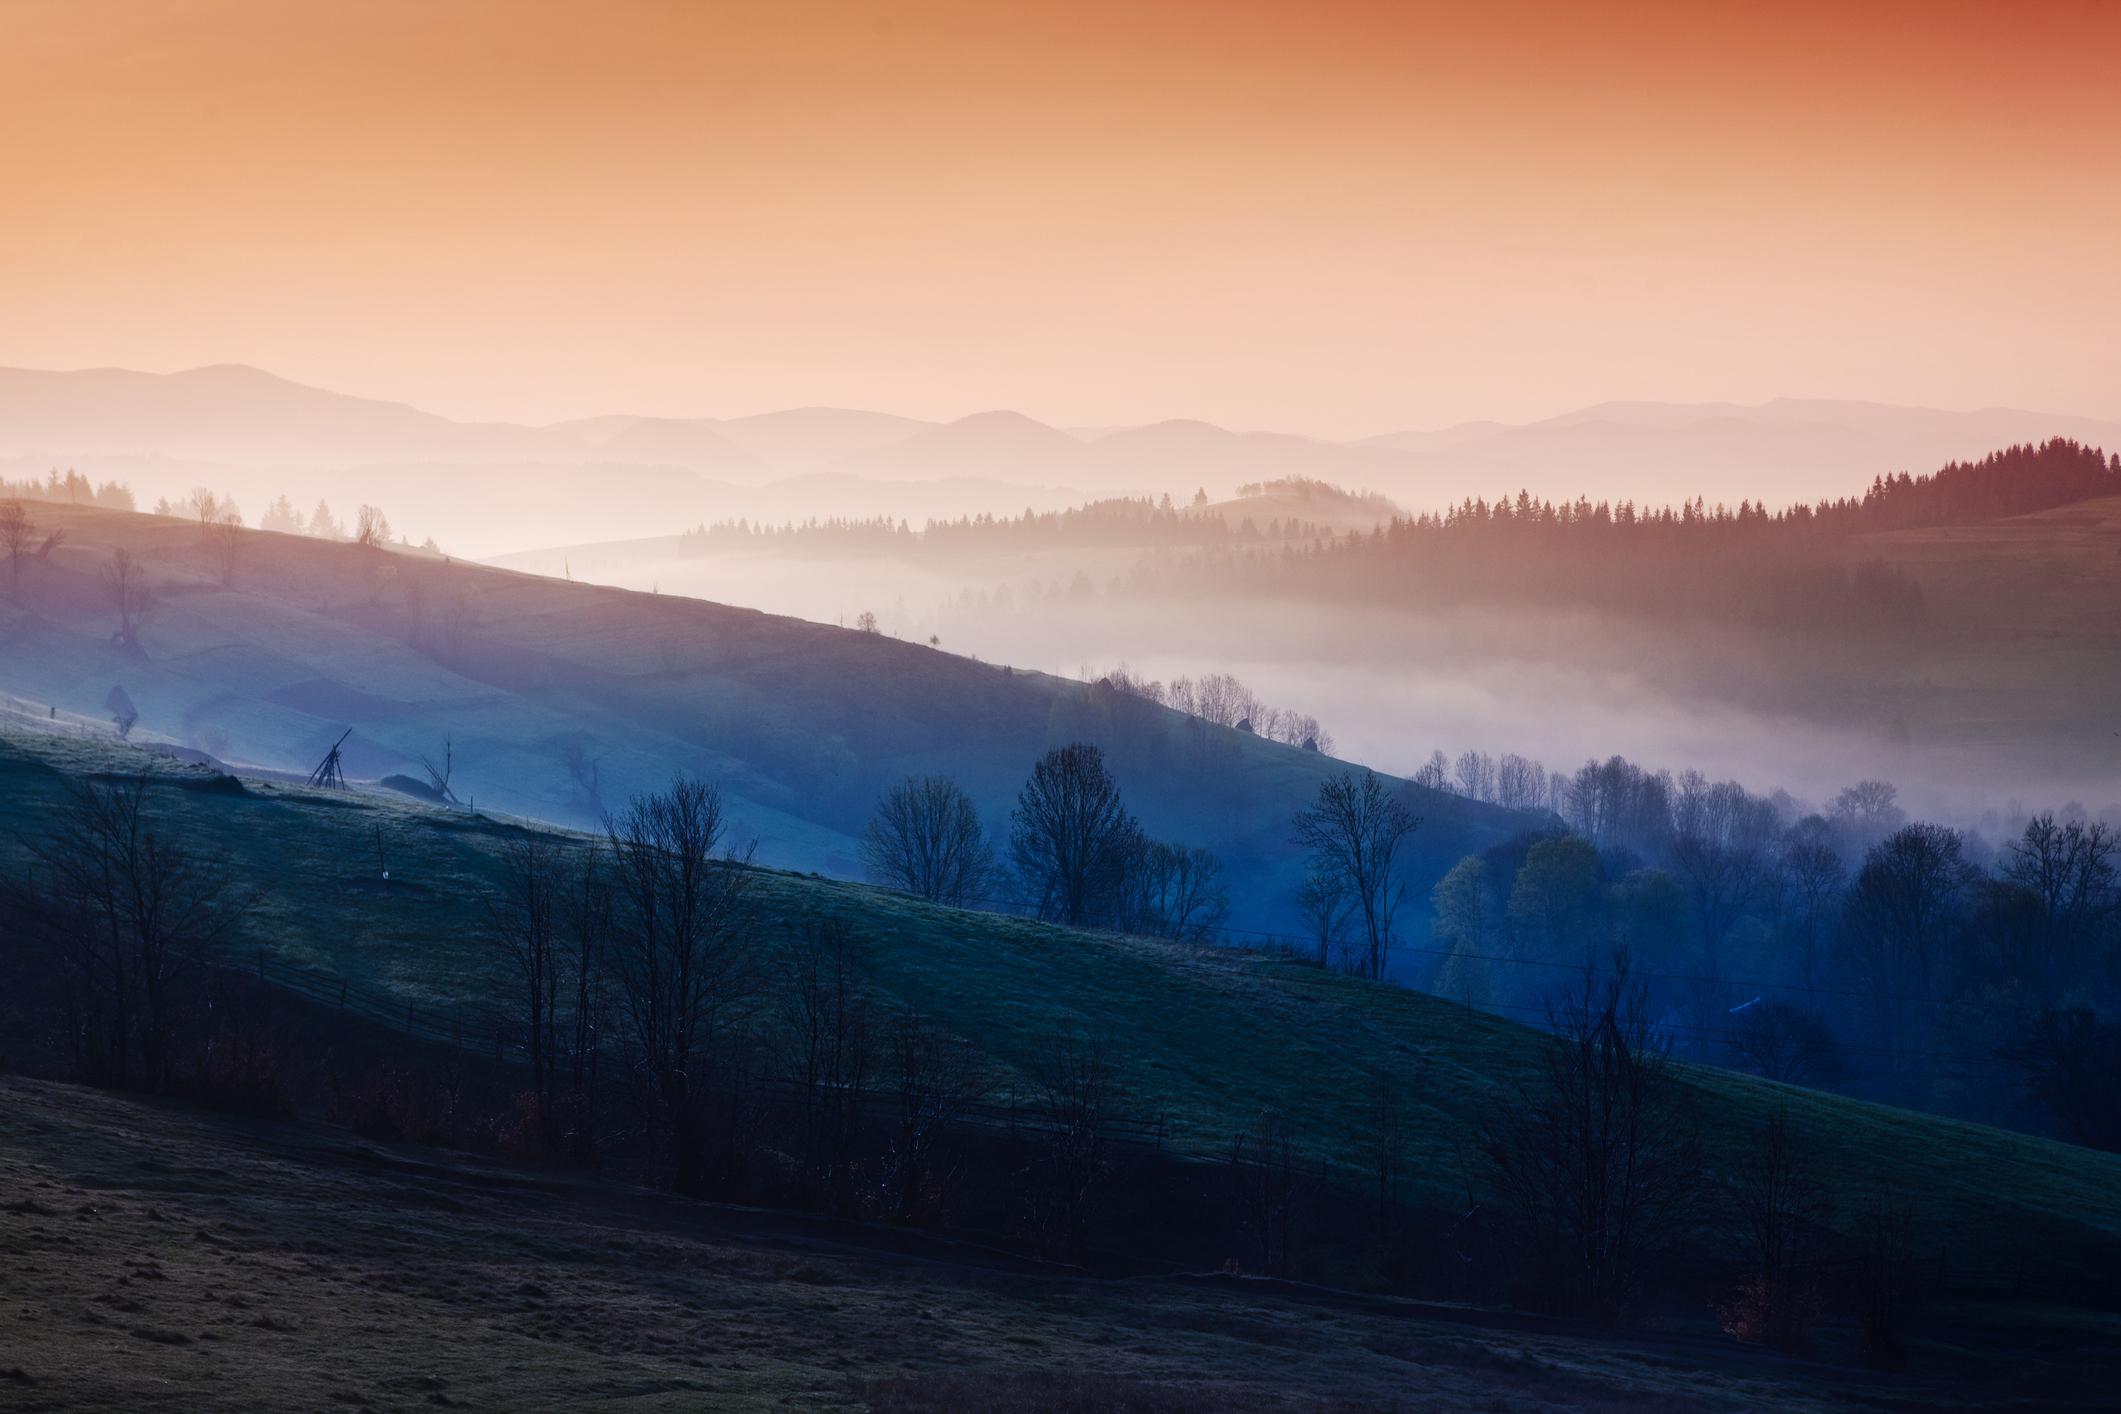 Mountains in morning fog